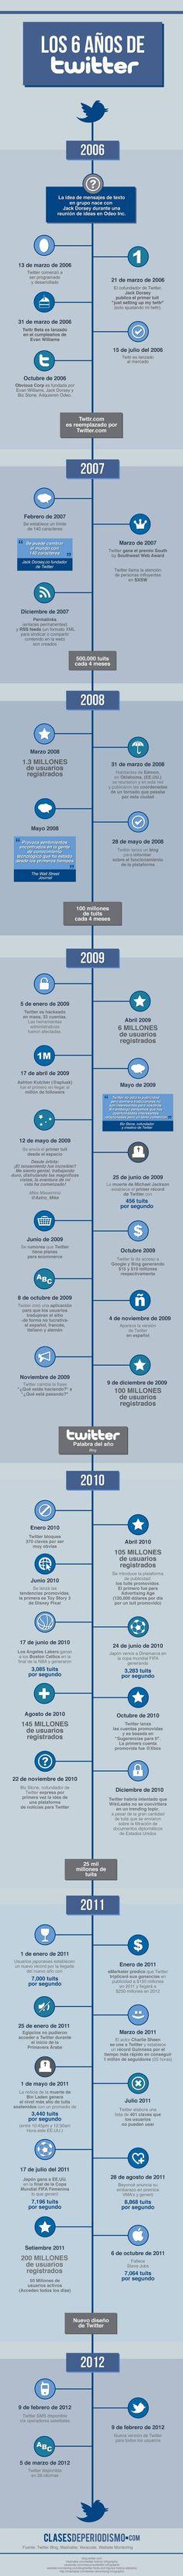 La Historia de Twitter hasta inicios de 2012 #SocialMediaMarketing #Twitter Vía: @ClasesDePeriodismo